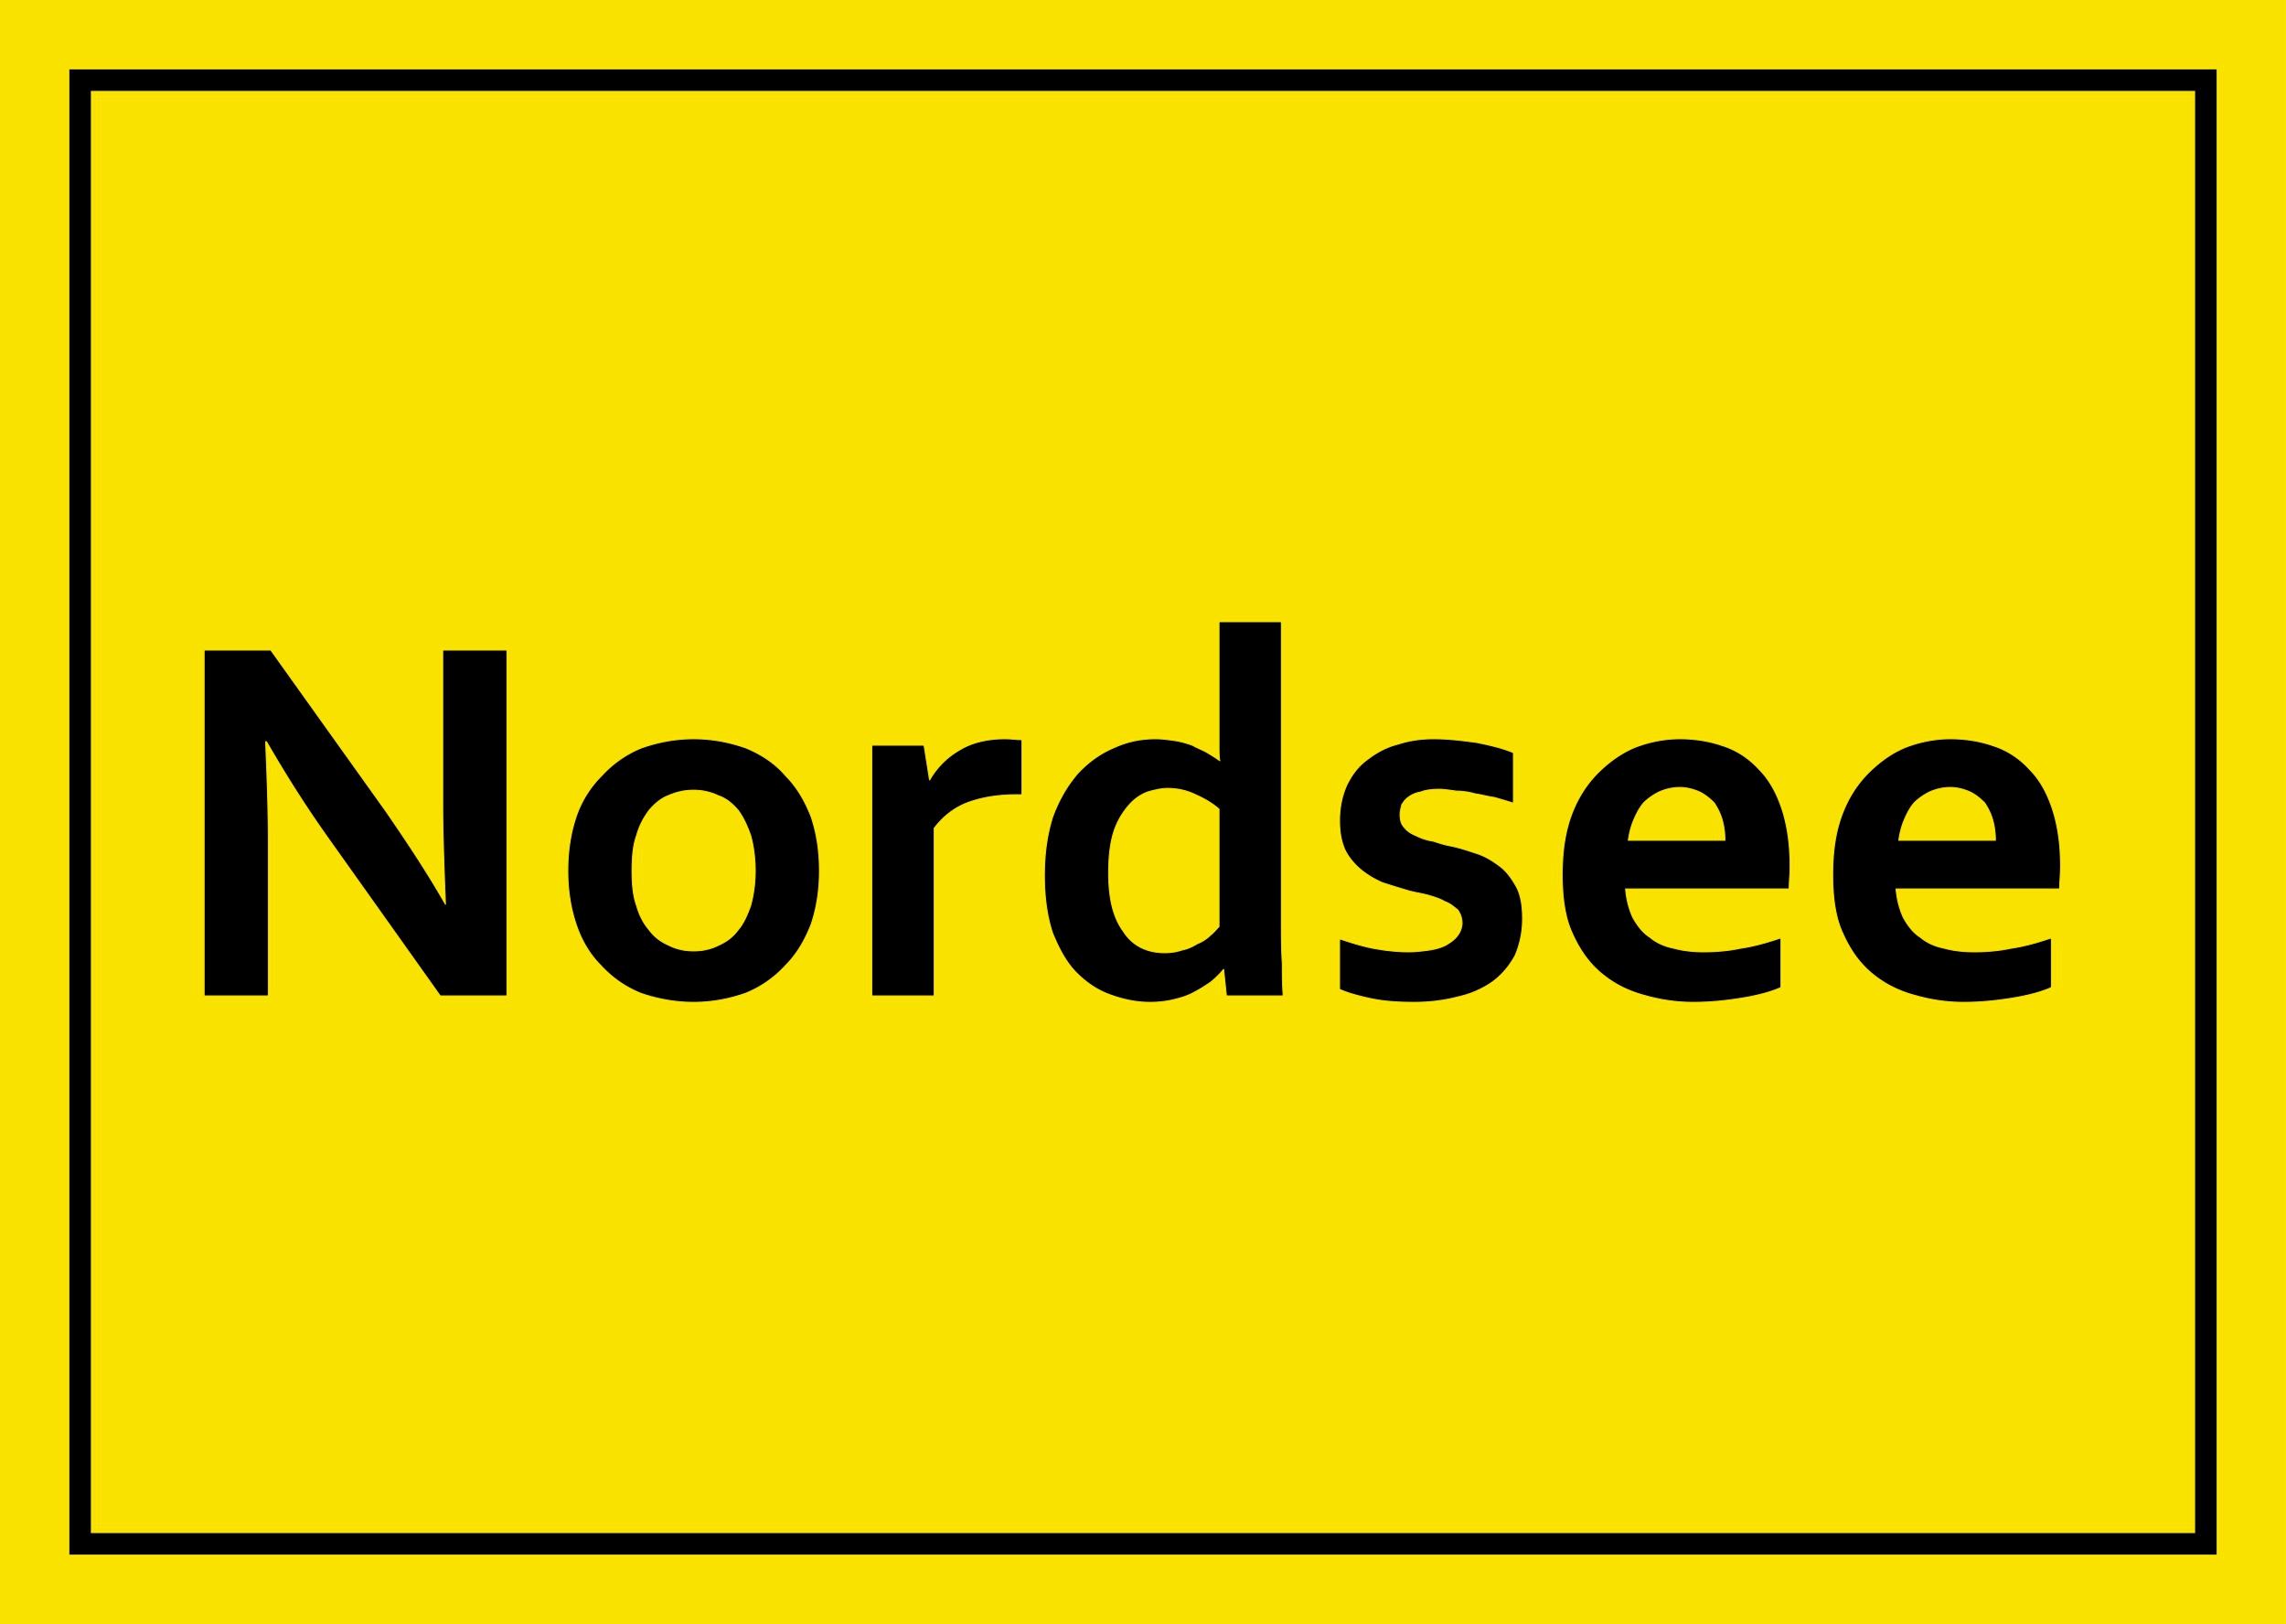 Autocollant Nordsee – Bild 1